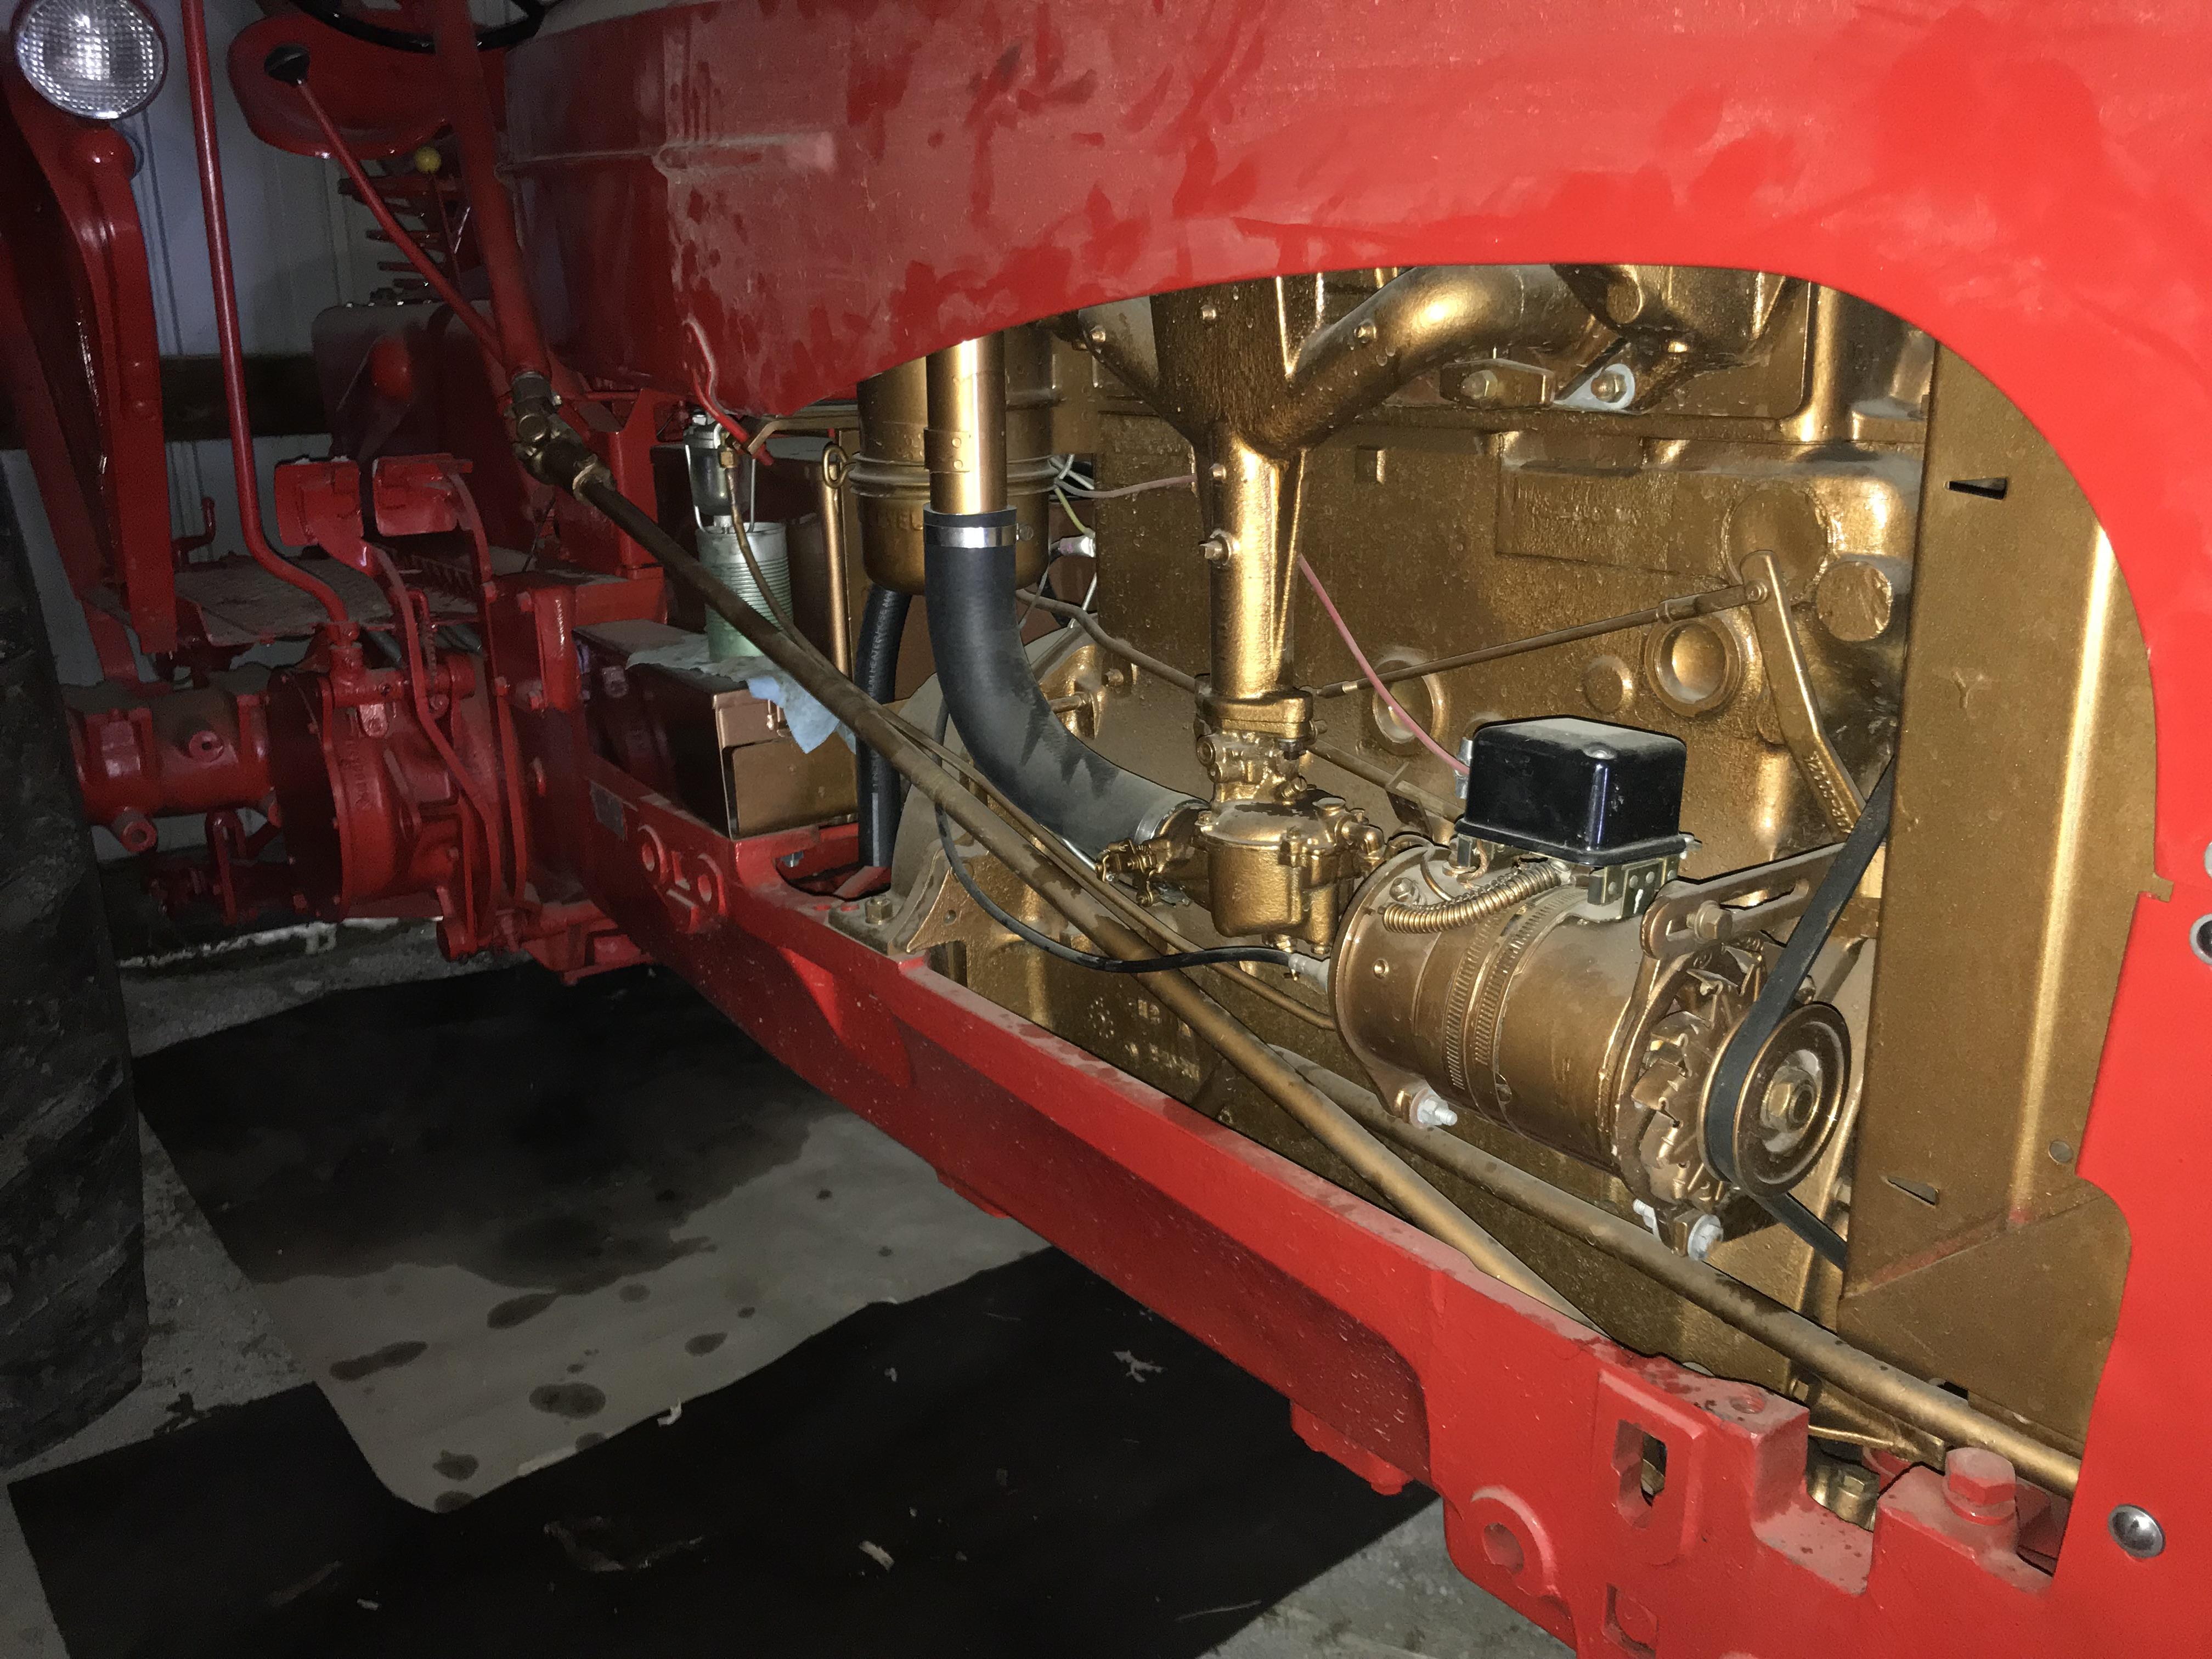 Lot 23 - Massey-Harris Mdl.444 S#71434, WF, New Rubber (older restoration)